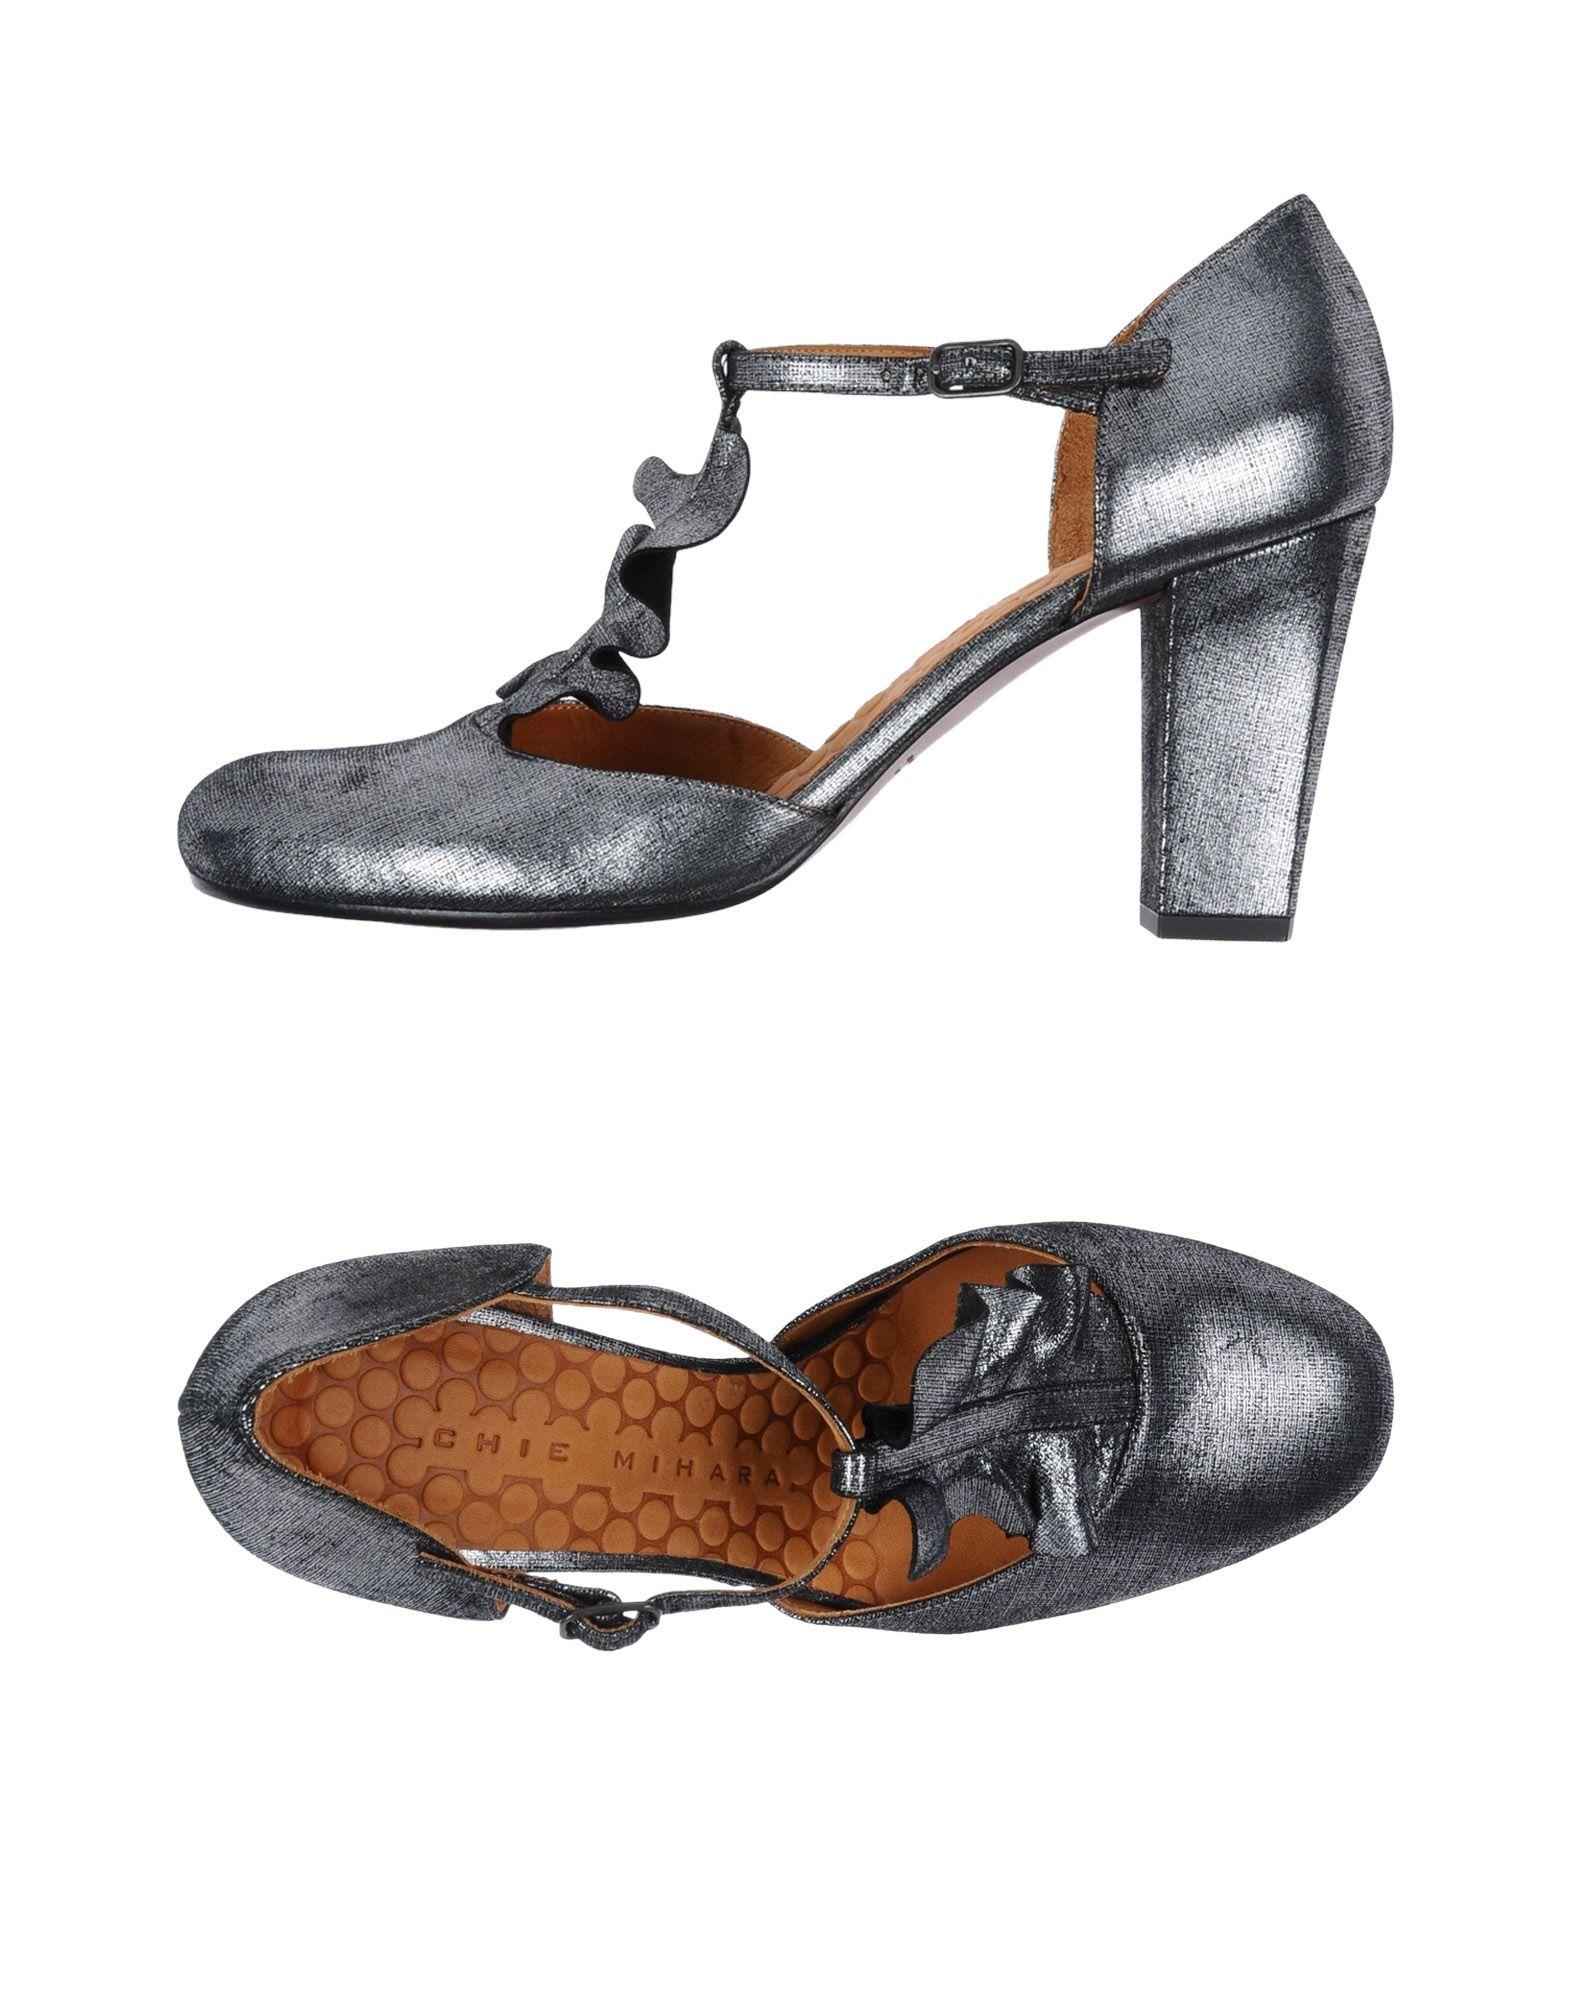 Stilvolle billige Schuhe Damen Chie Mihara Pumps Damen Schuhe  11485694DN 197312